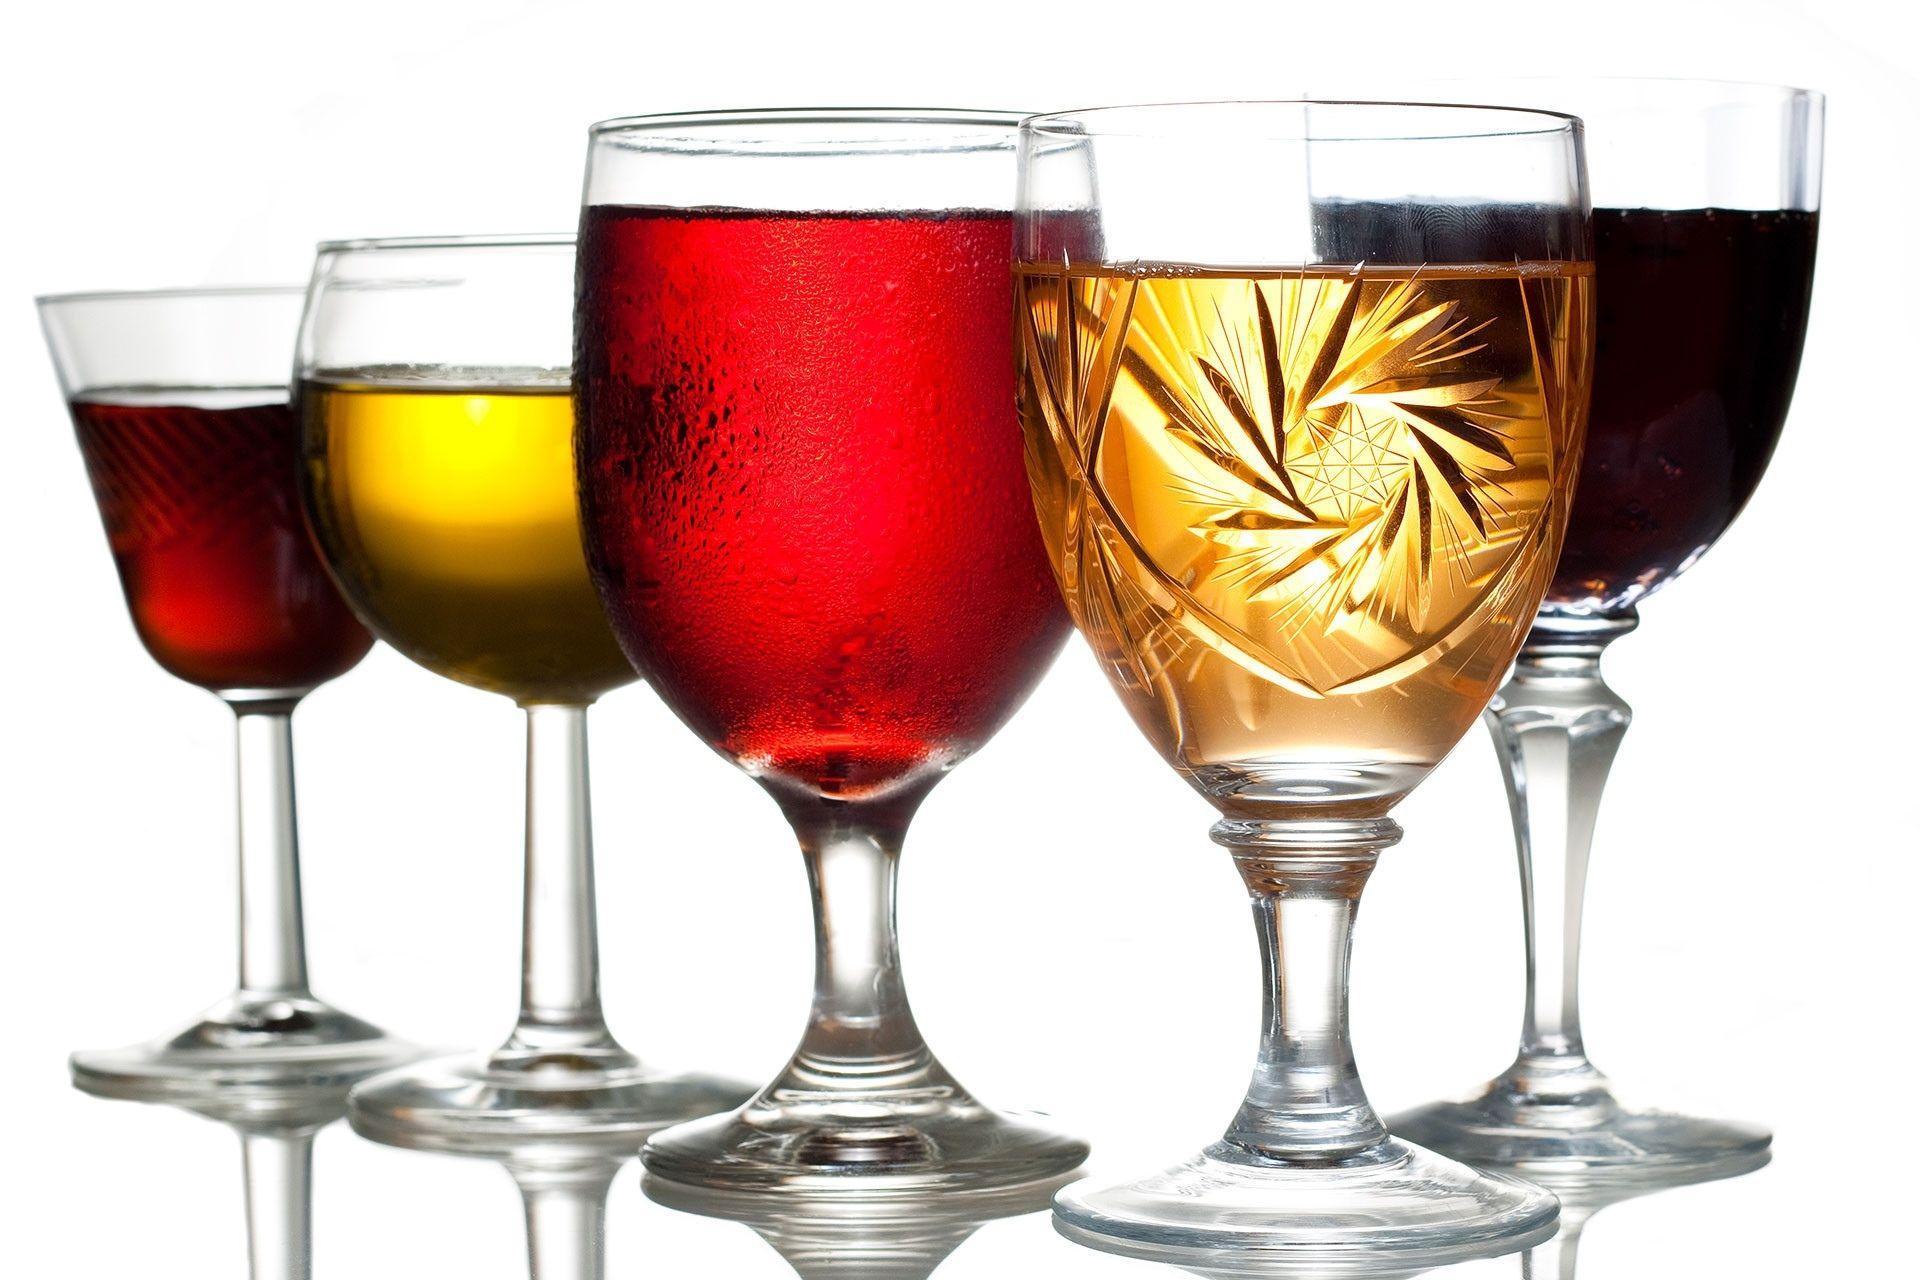 Hozyajka Doma Vskryla Stenu I Razgadala Tajnu Mafii 30 H Godov Zhenshina Zanimalas Remontom V Svoem Dome I Sluchajno Obnaruzhila Tajn In 2020 Alcohol Glass Goji Berries